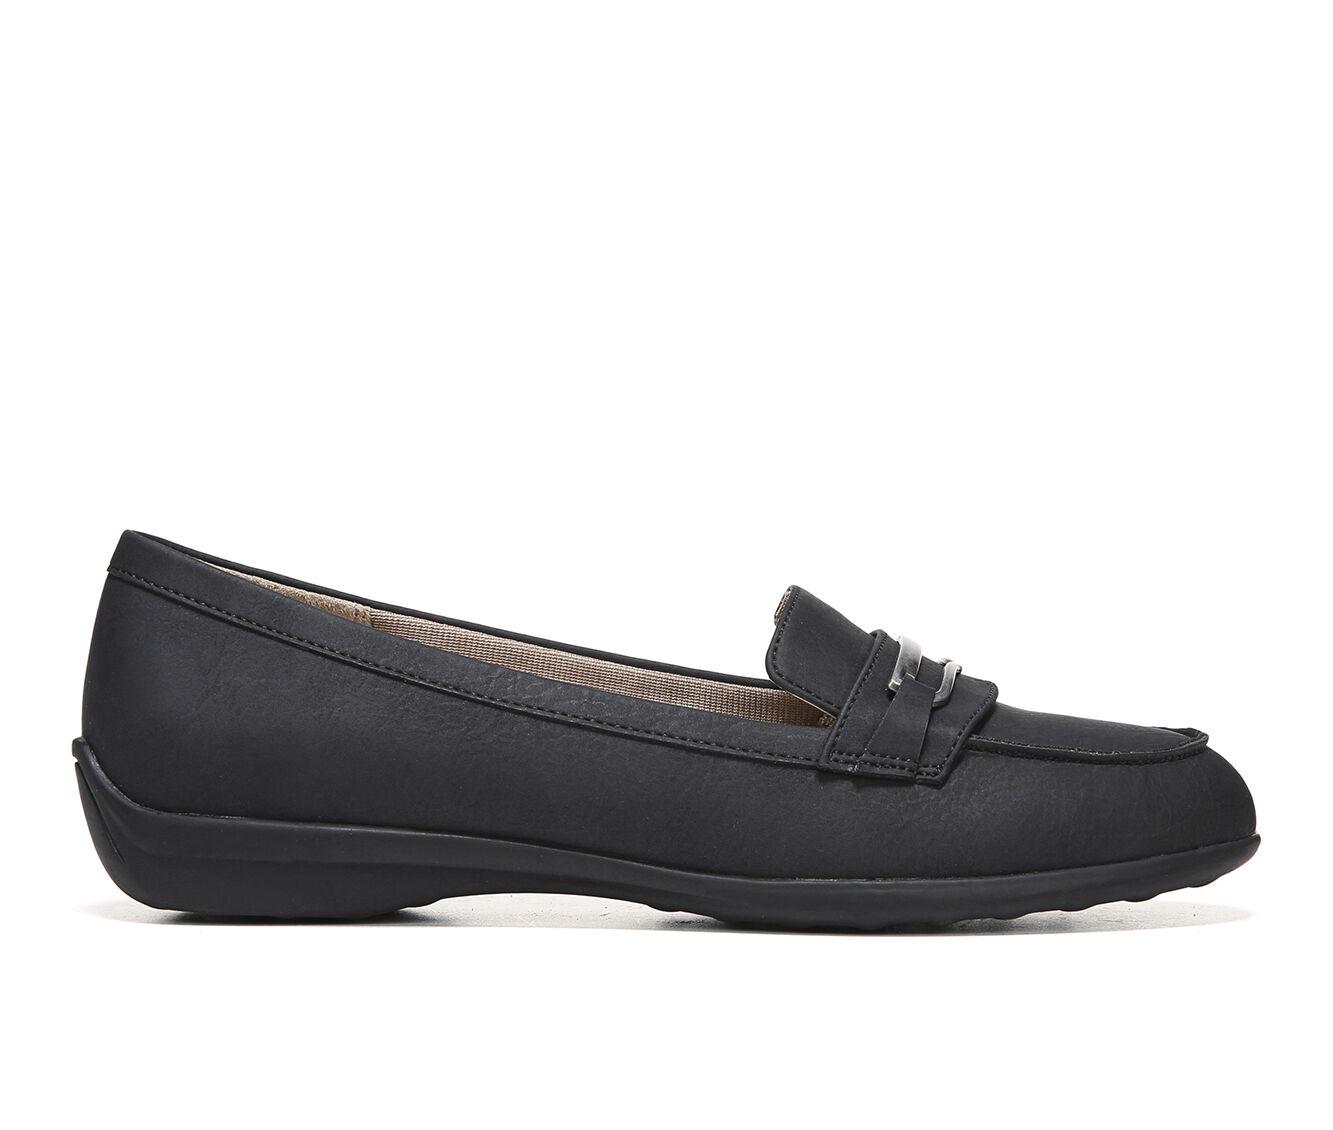 Women's LifeStride Phoebe Shoes Black